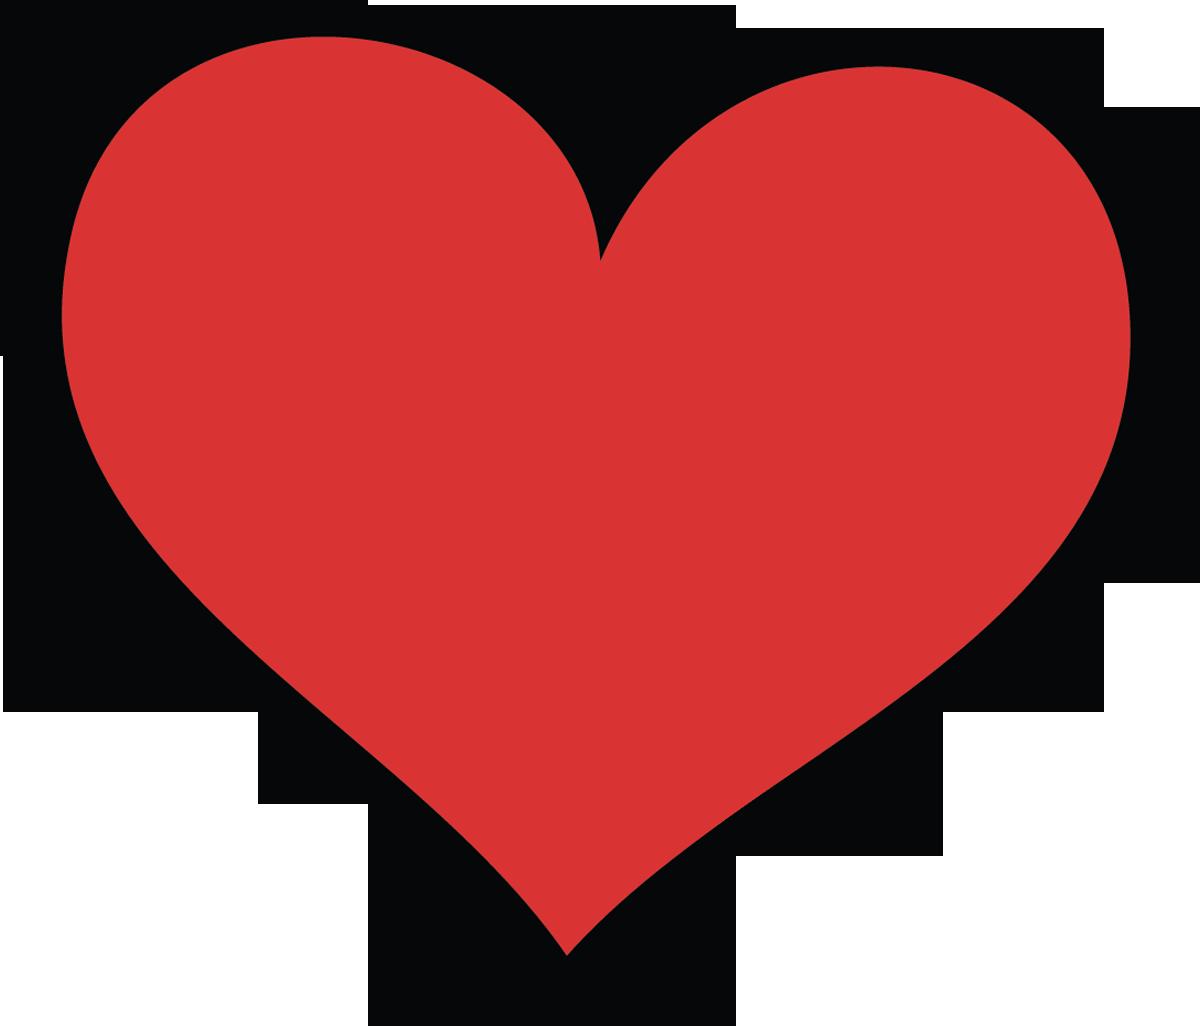 clipart love heart-clipart love heart-1